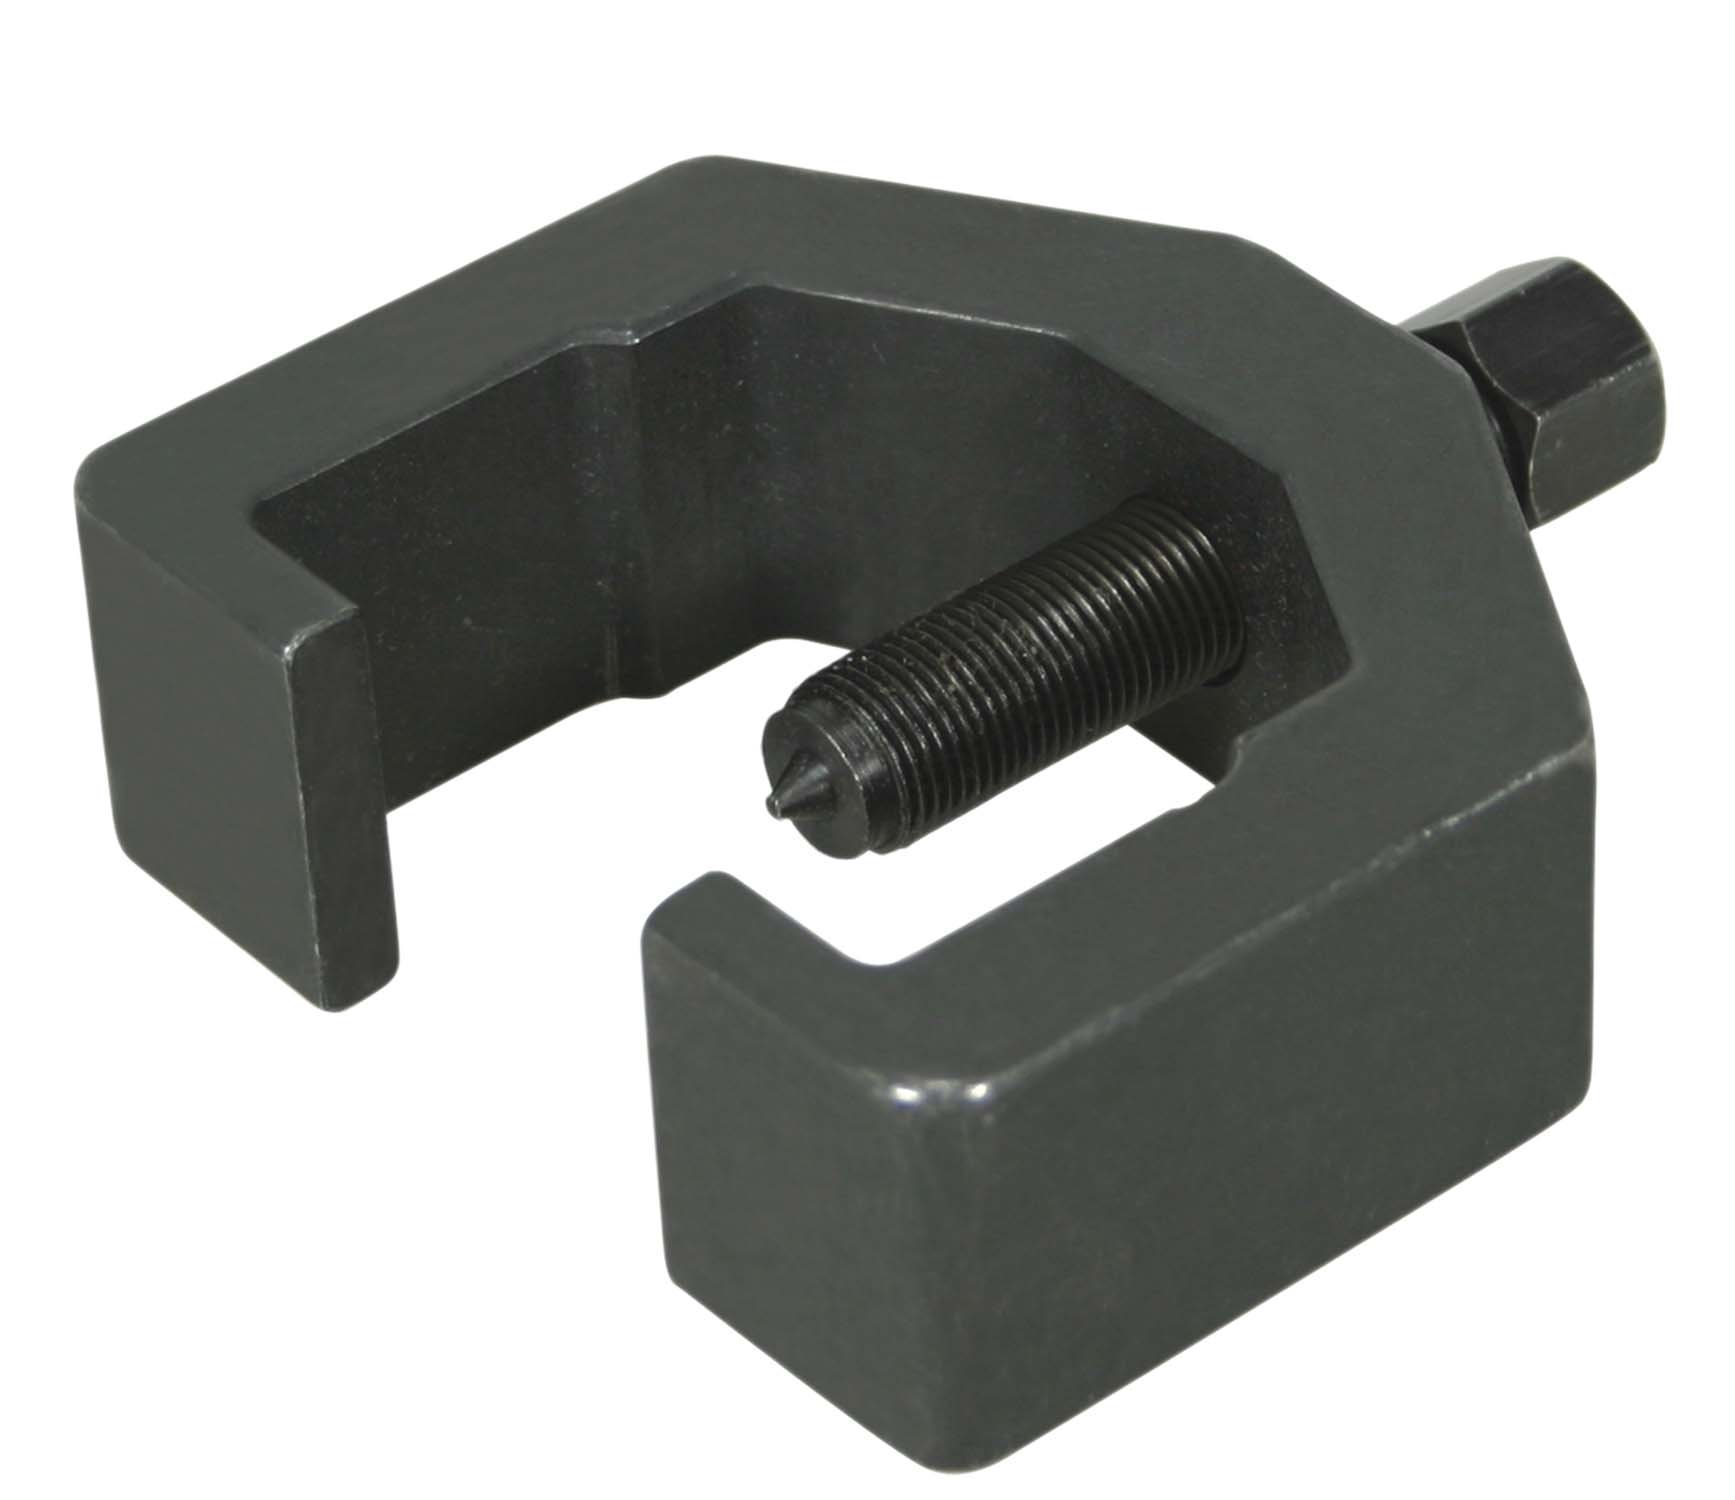 Lisle 41970 Heavy Duty Pitman Arm Puller for Ford